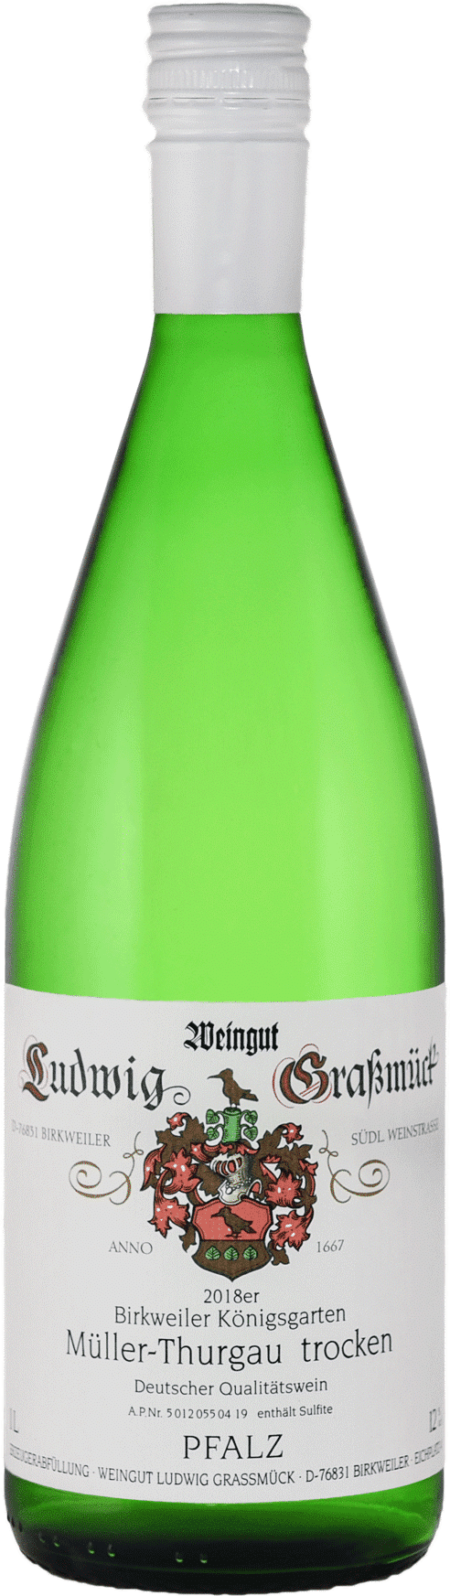 Weingut Ludwig Graßmück, Simon Graßmück, Müller Thurgau, trocken